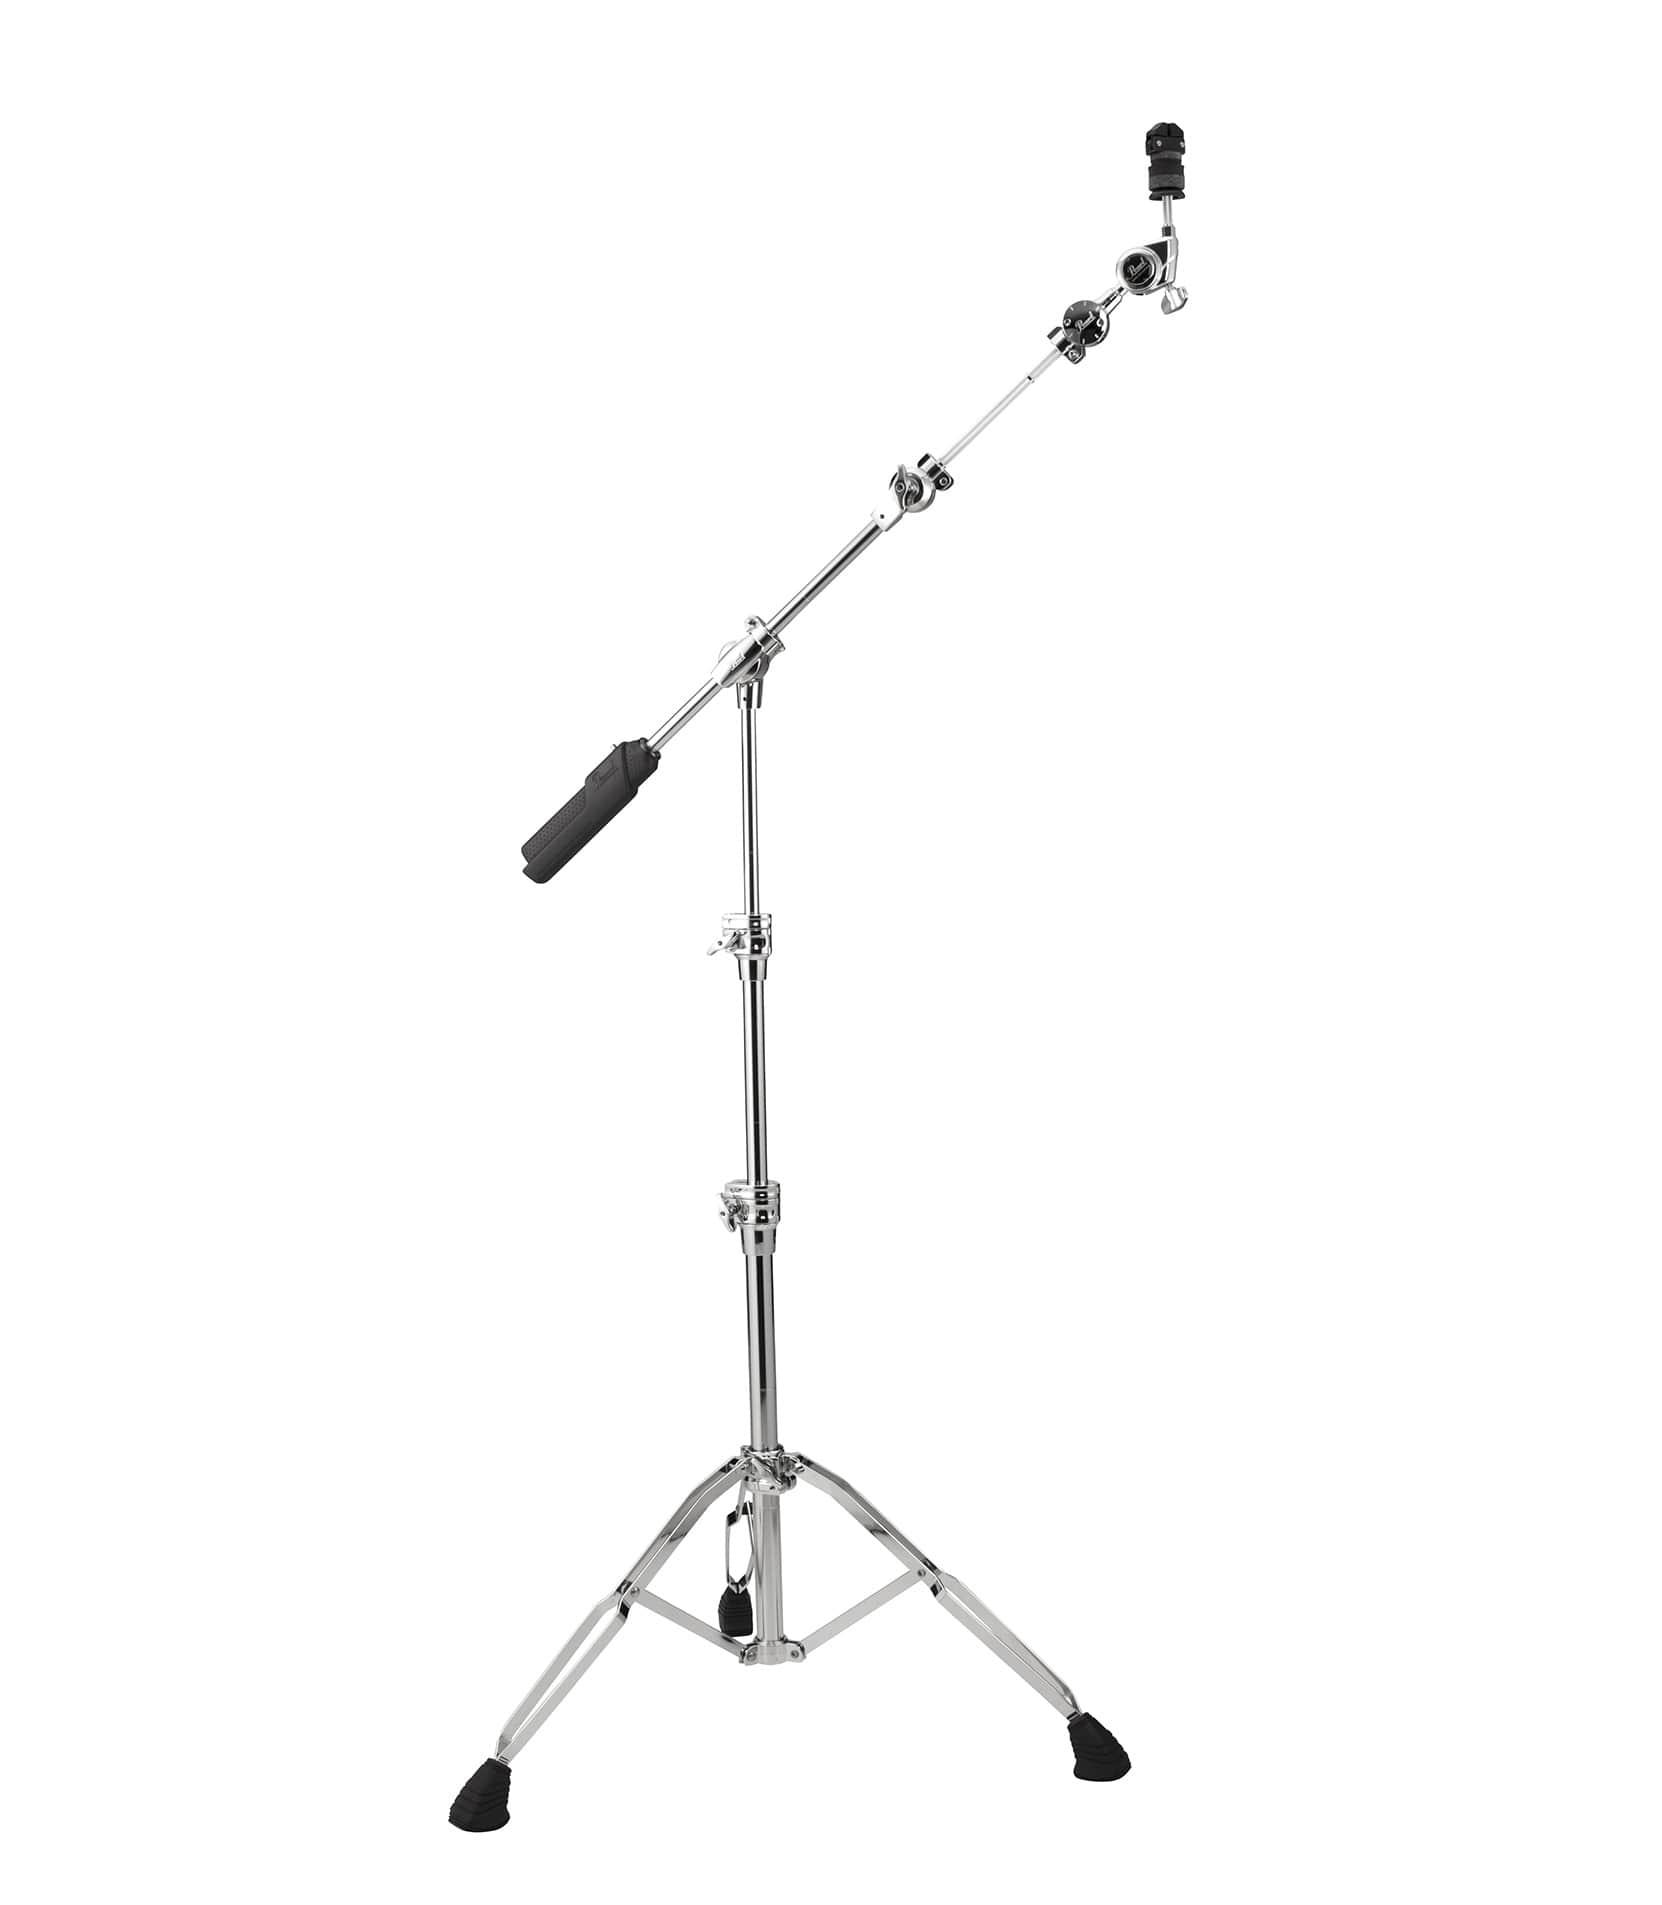 buy pearl bc 2030 cymbal boom stand gyro lock tilter doub